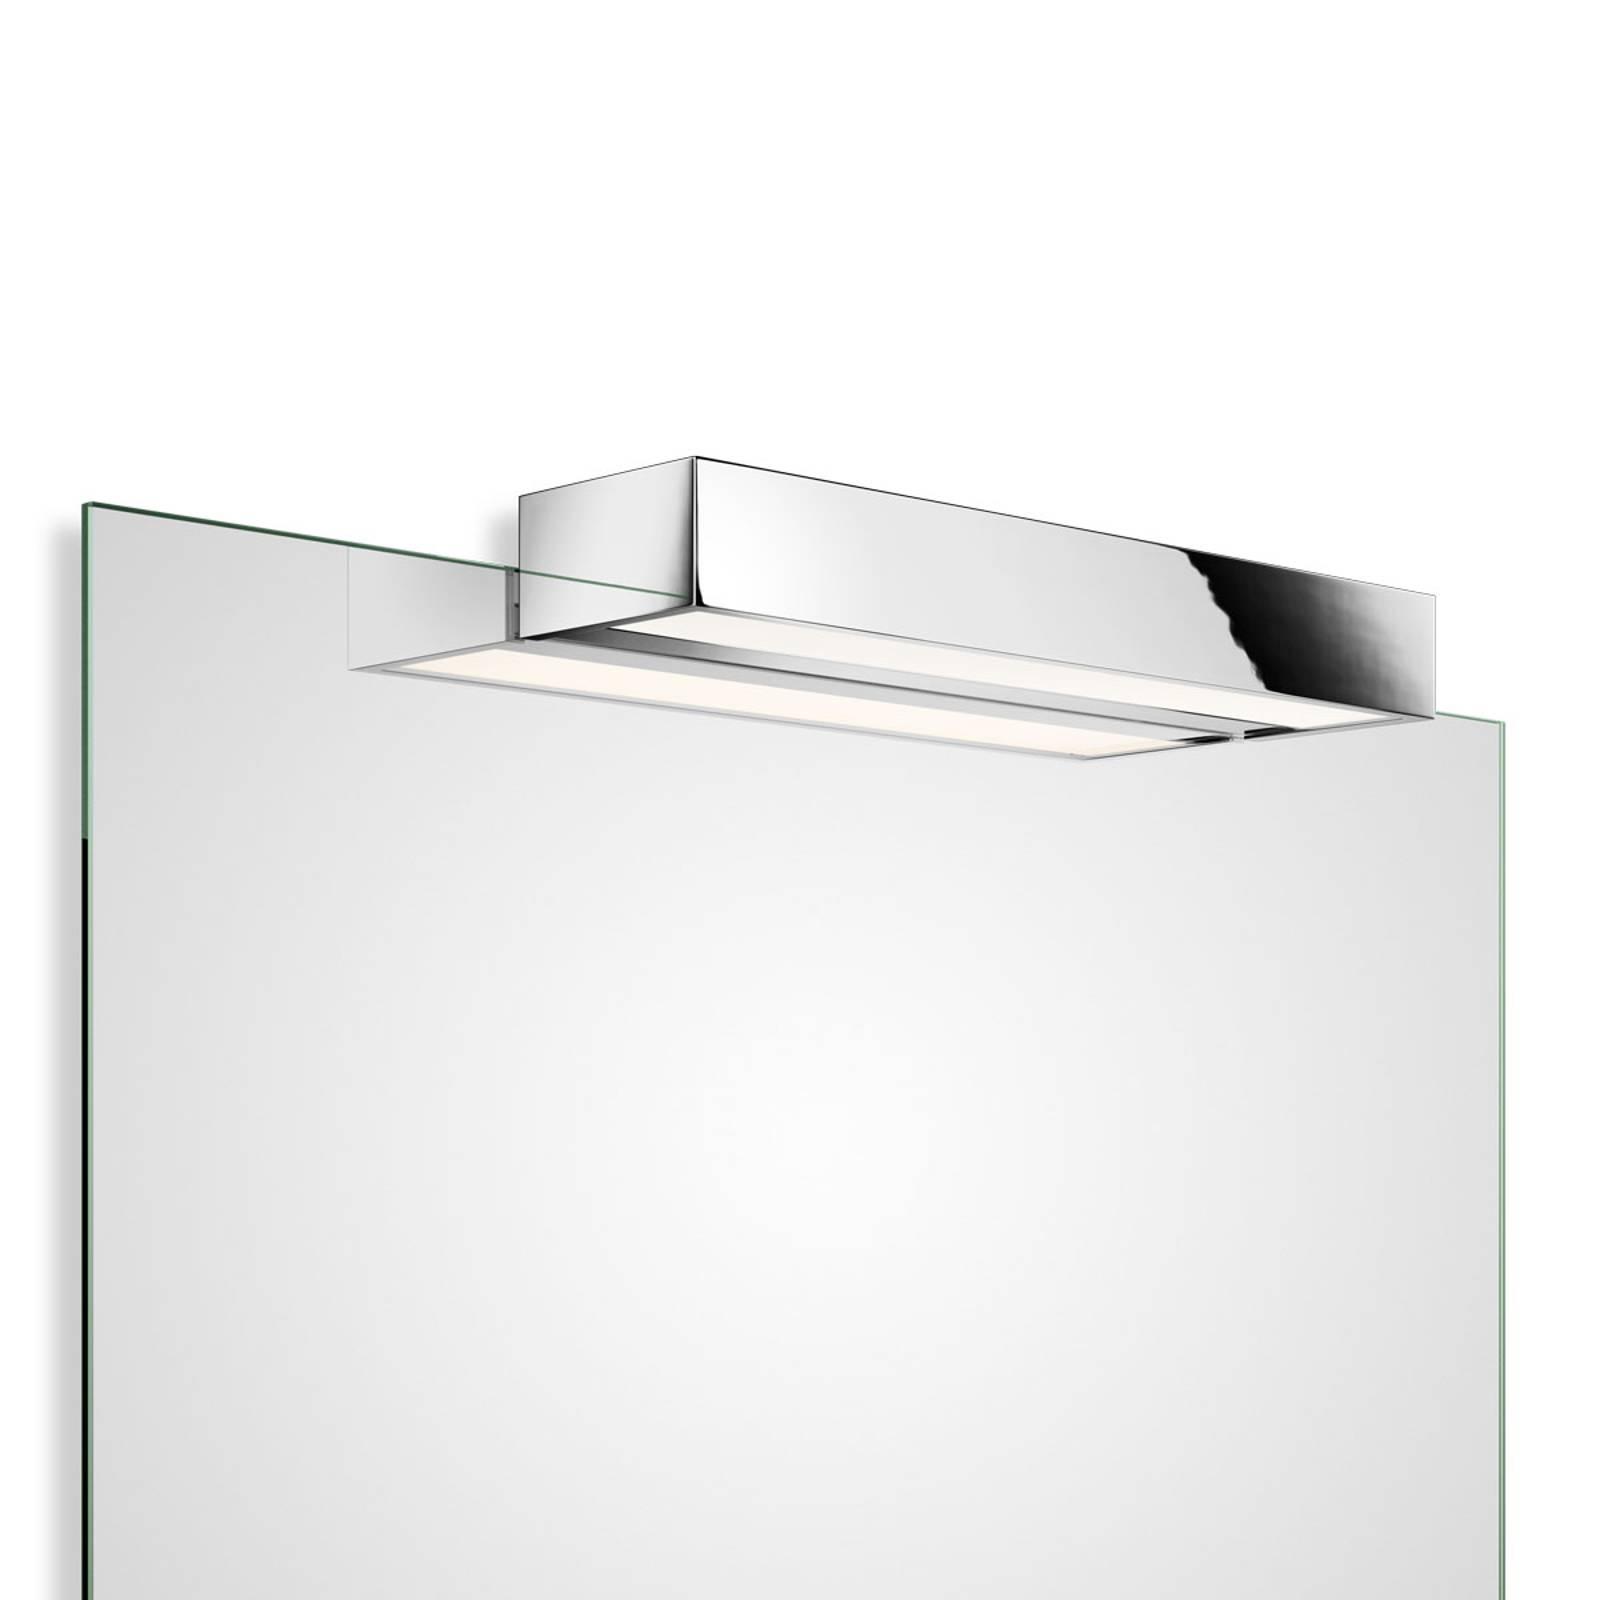 Decor Walther Box 1-40 N applique miroir LED 3000K